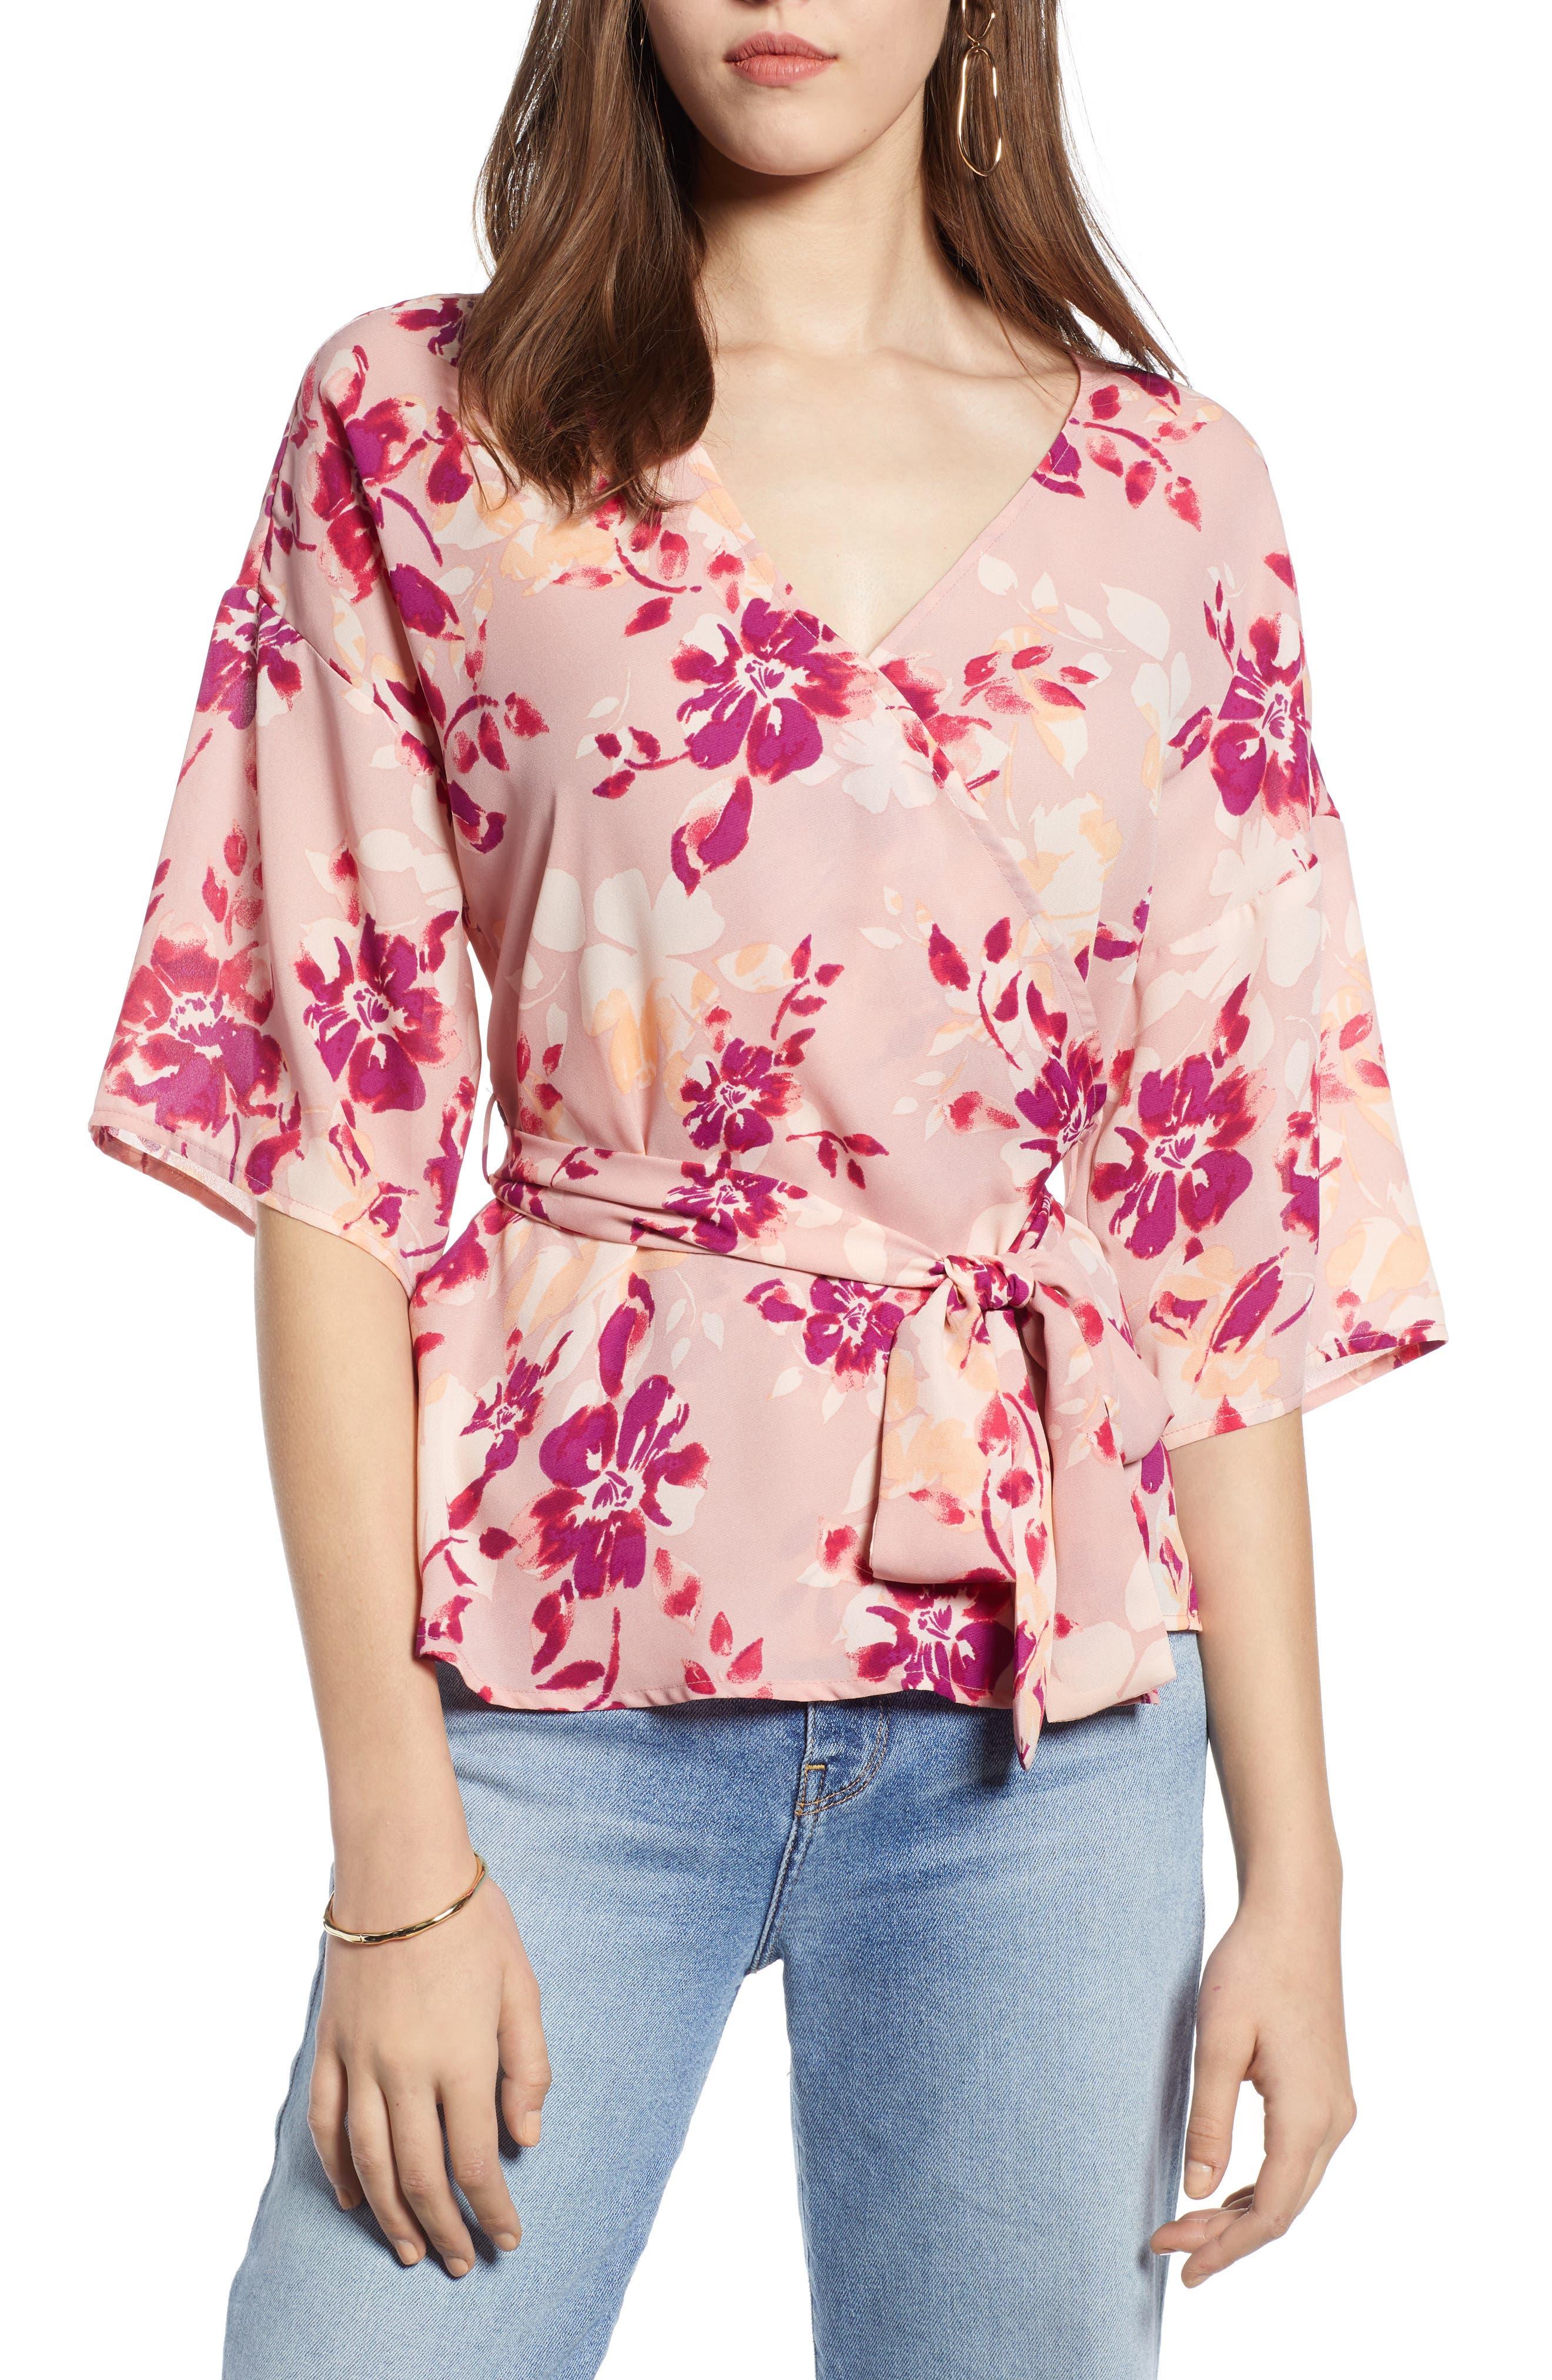 Vintage & Retro Shirts, Halter Tops, Blouses Womens Halogen Faux Wrap Top $59.00 AT vintagedancer.com